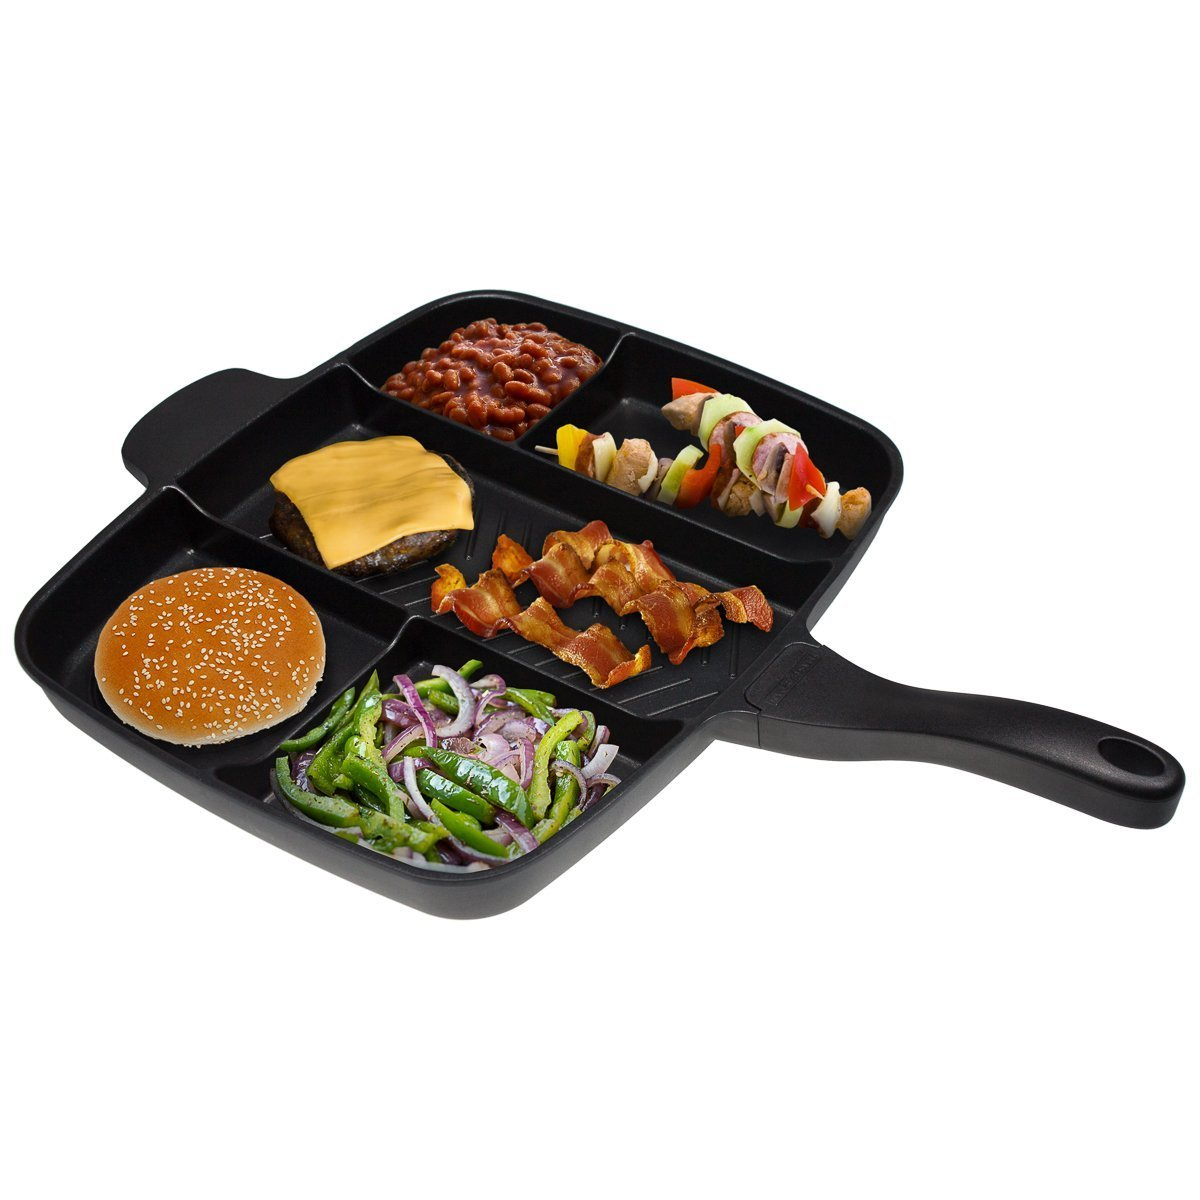 Amazon.com: NewYorkTonerTM Master Pan Non-Stick Divided Grill - Fry - Owen Meal Skillet, 15